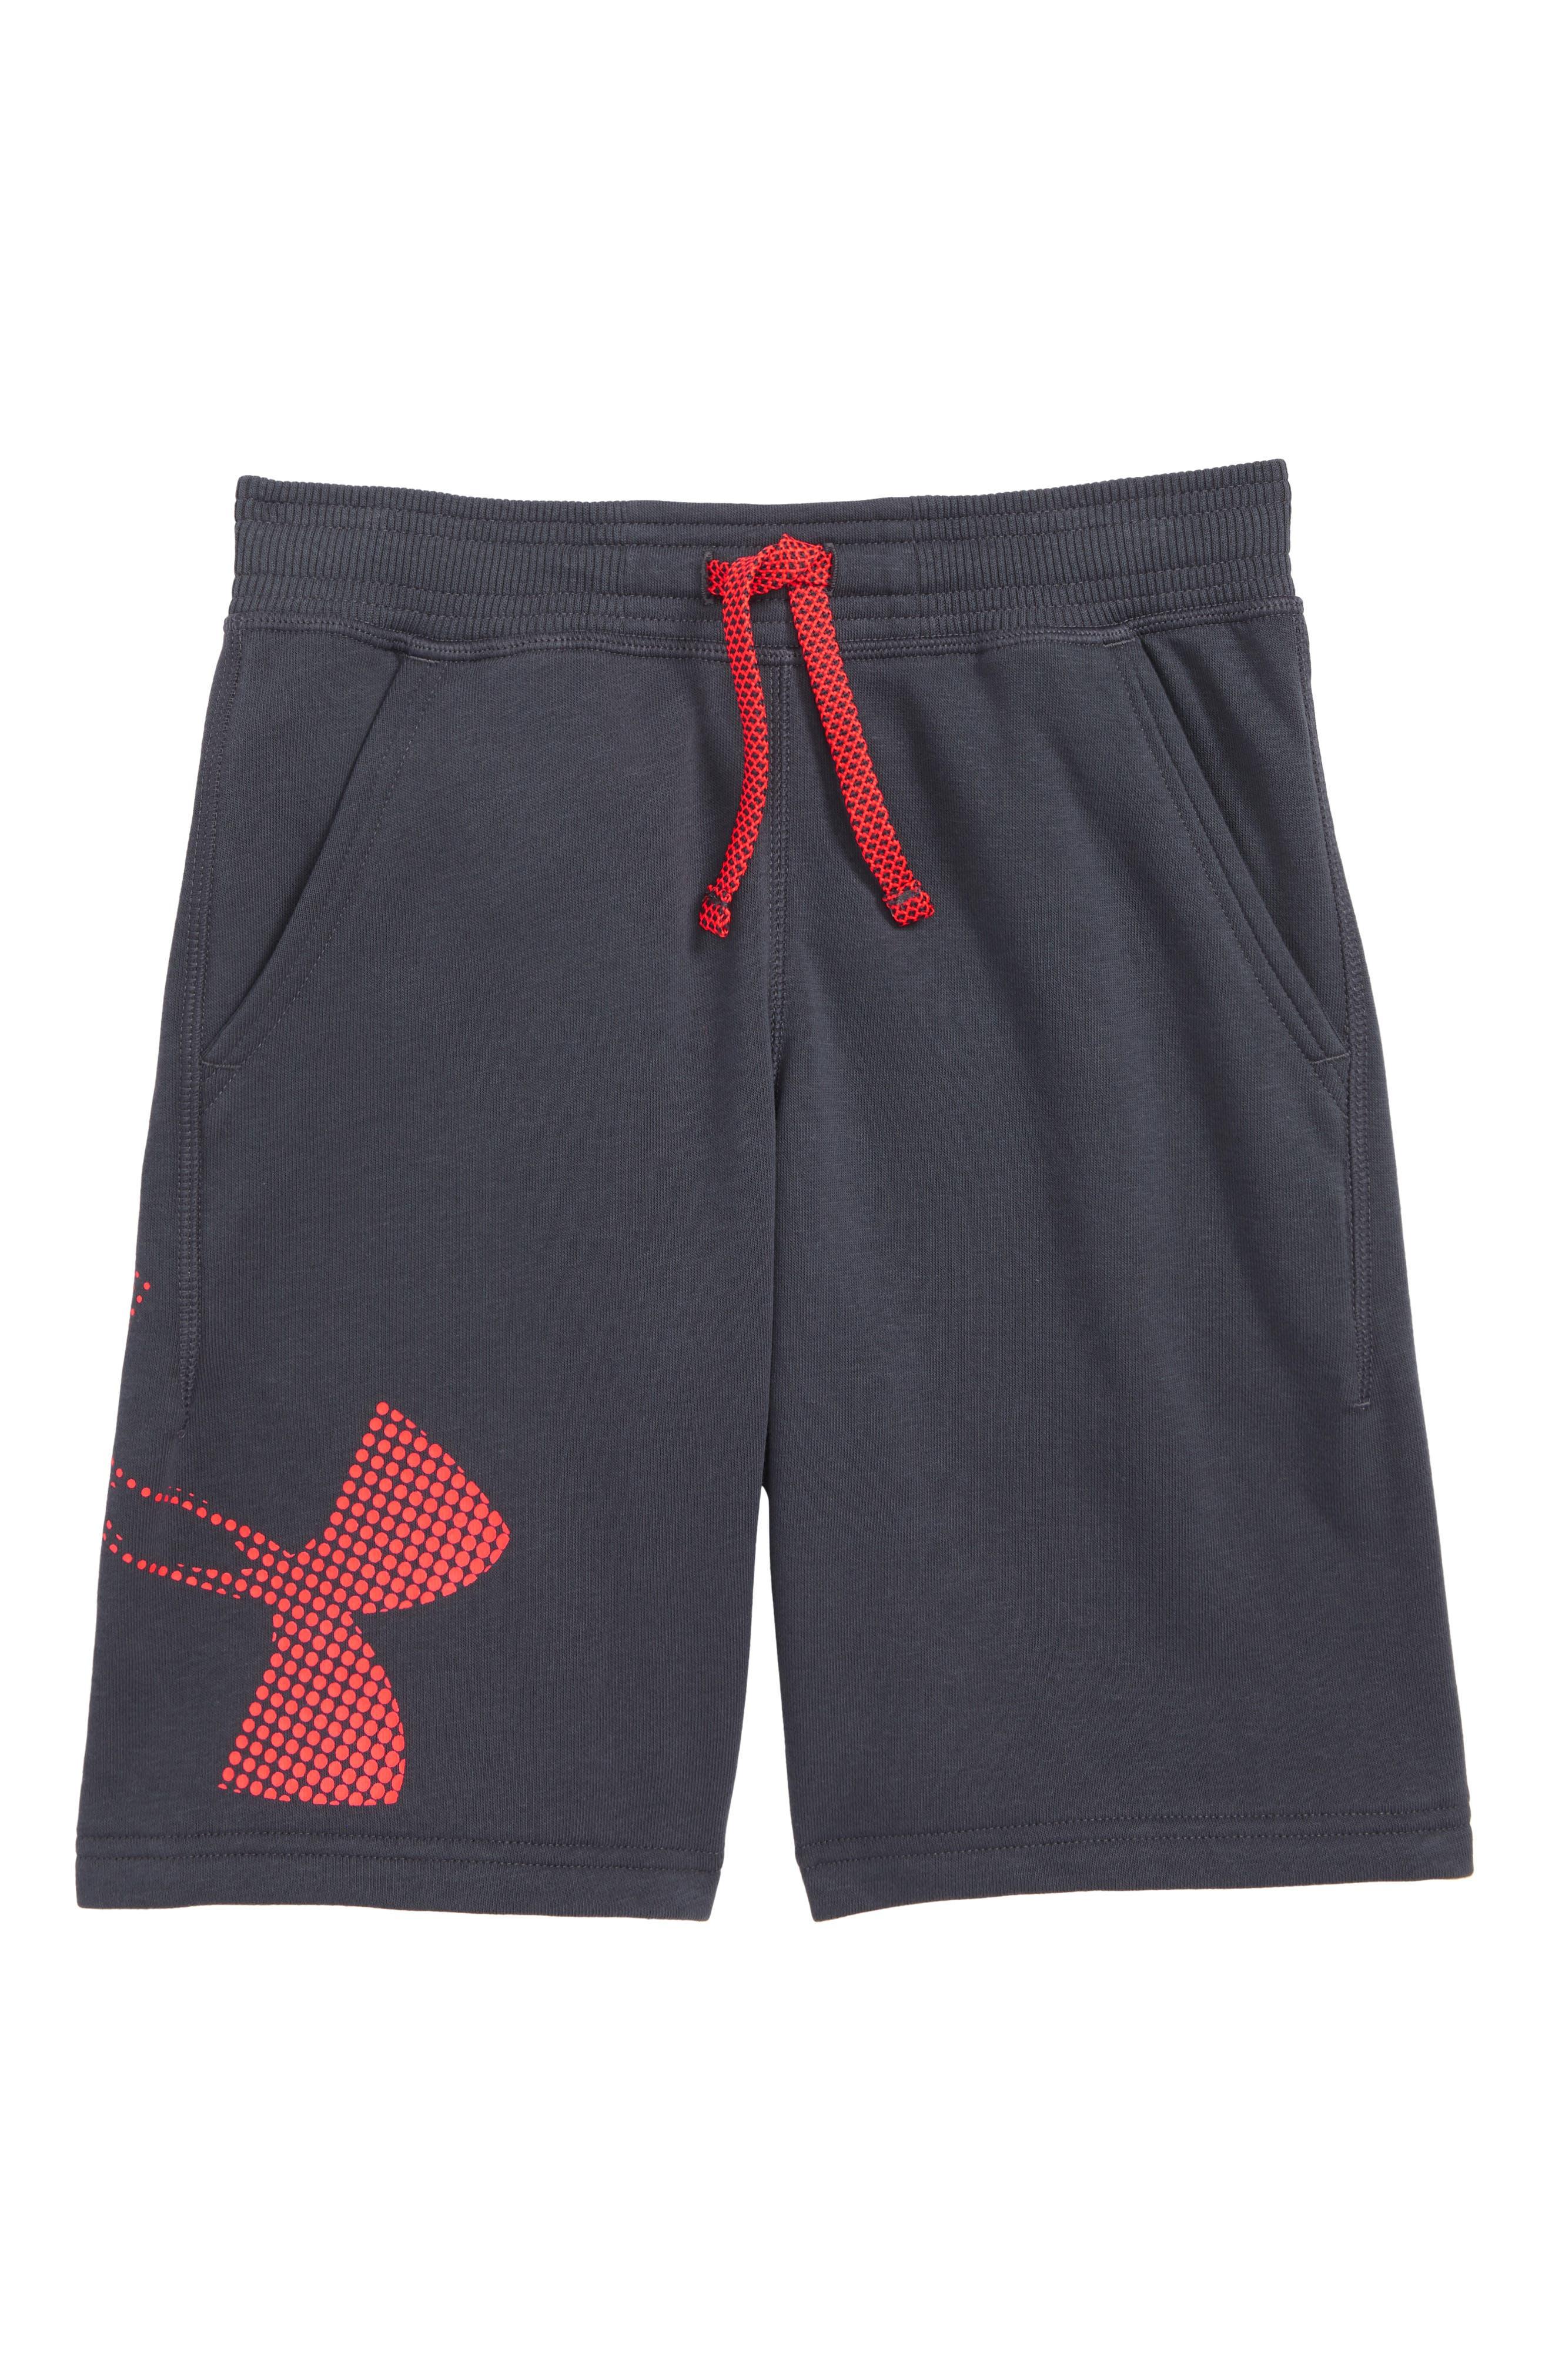 Under Armour Graphic Knit Shorts (Little Boys & Big Boys)